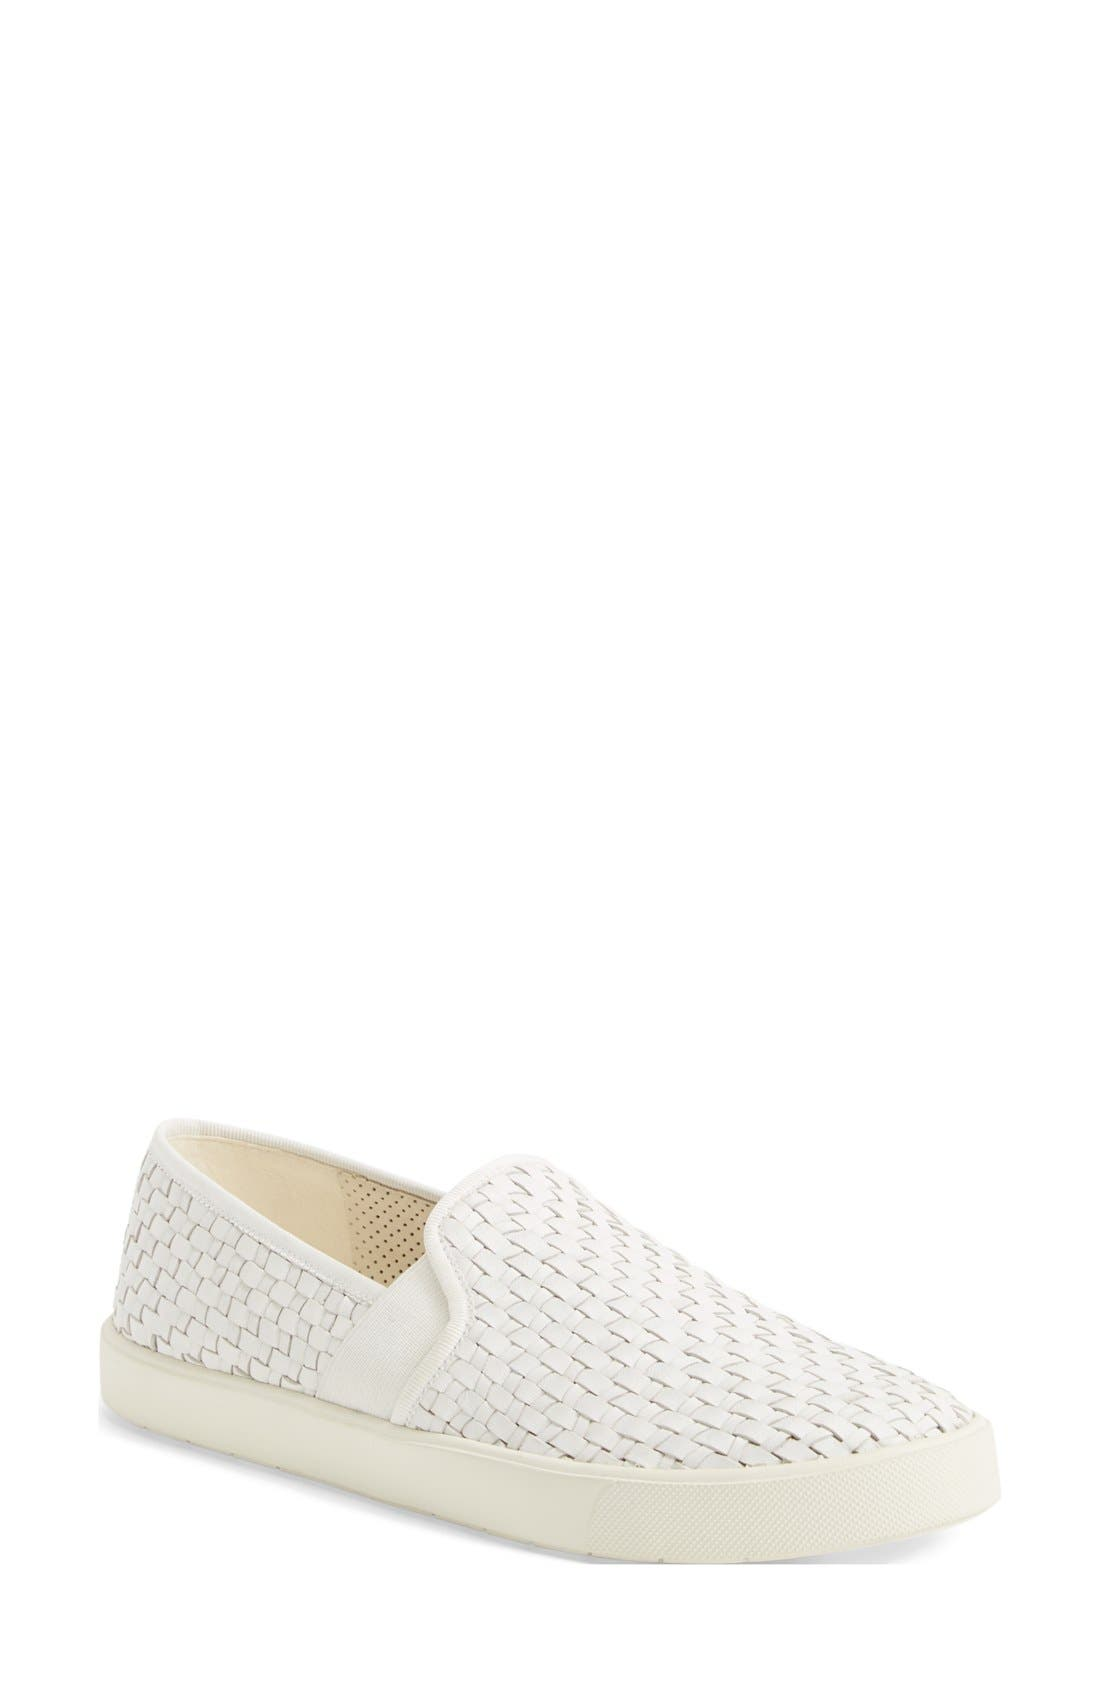 Alternate Image 1 Selected - Vince 'Preston' Slip-On Sneaker (Online Only)